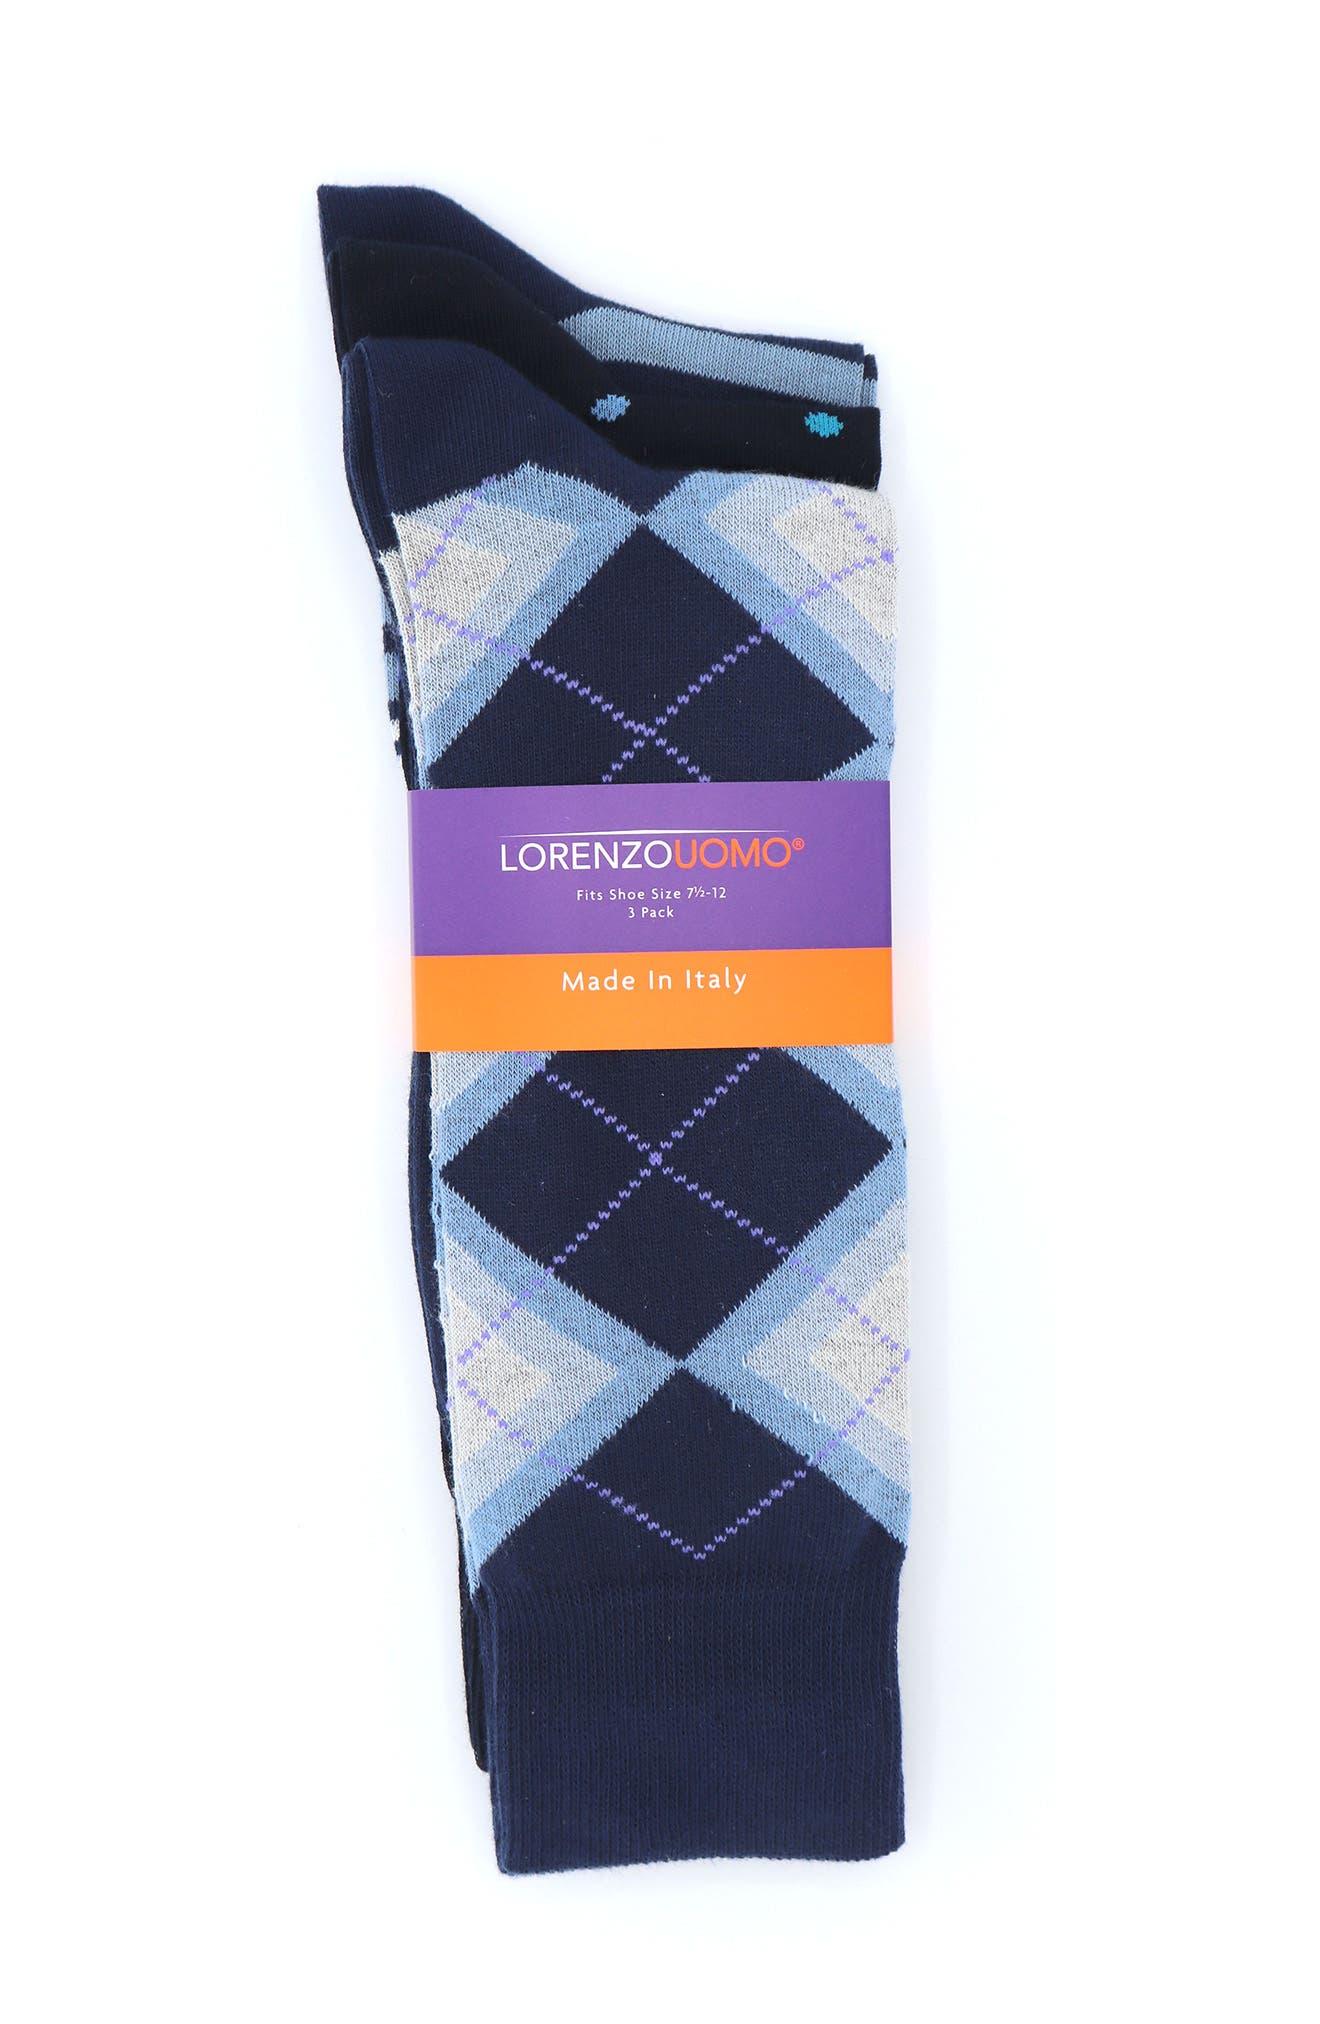 Image of Lorenzo Uomo Assorted Crew Socks - Pack of 3